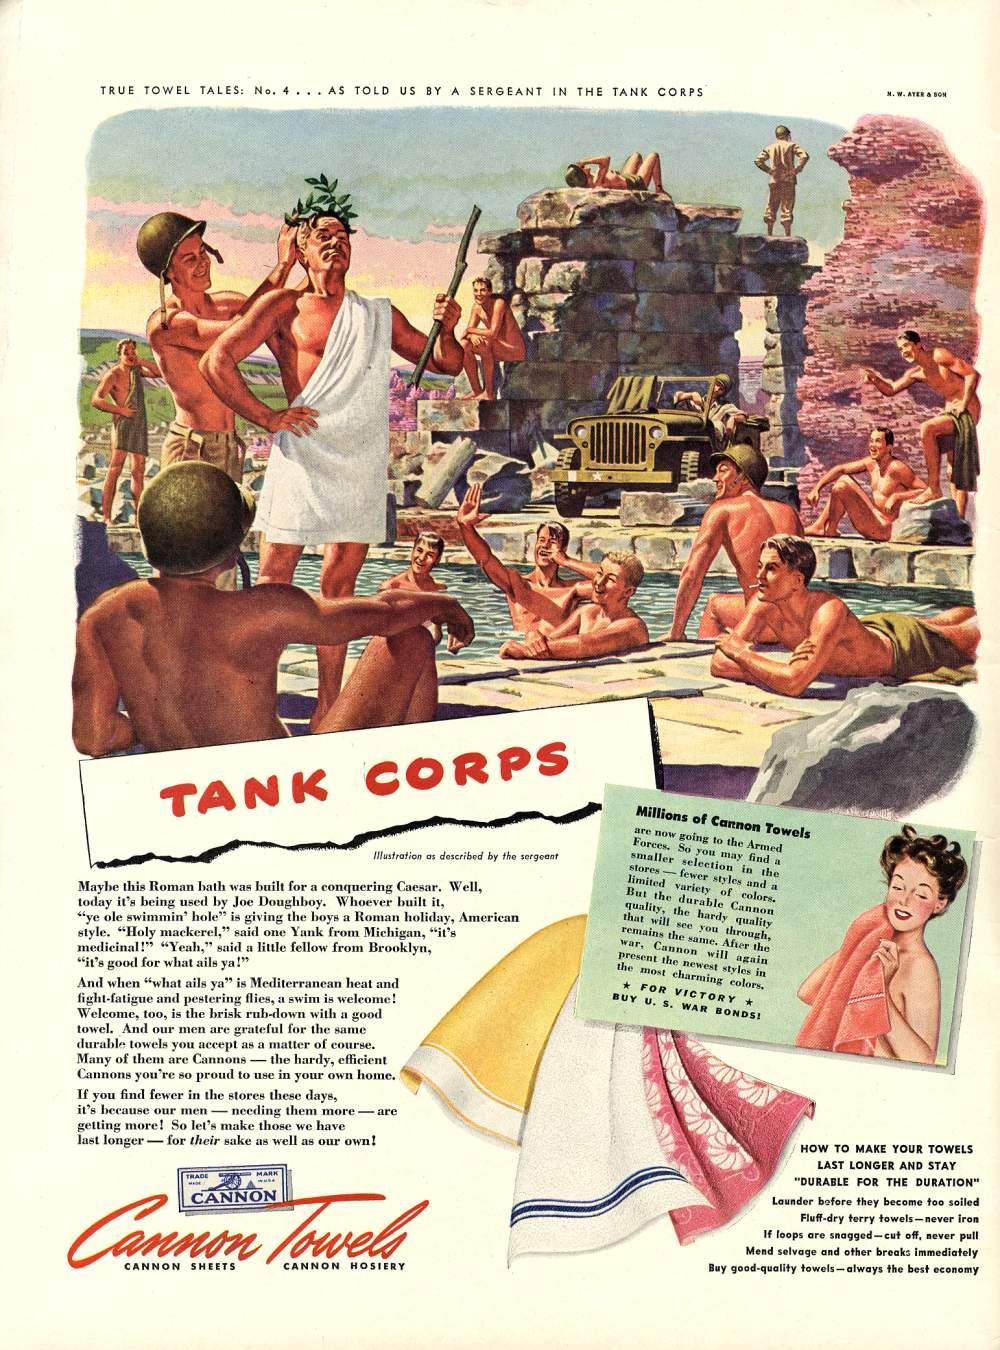 Vintage 1940s Common Towels Ads - Paradise Lost - Military Men